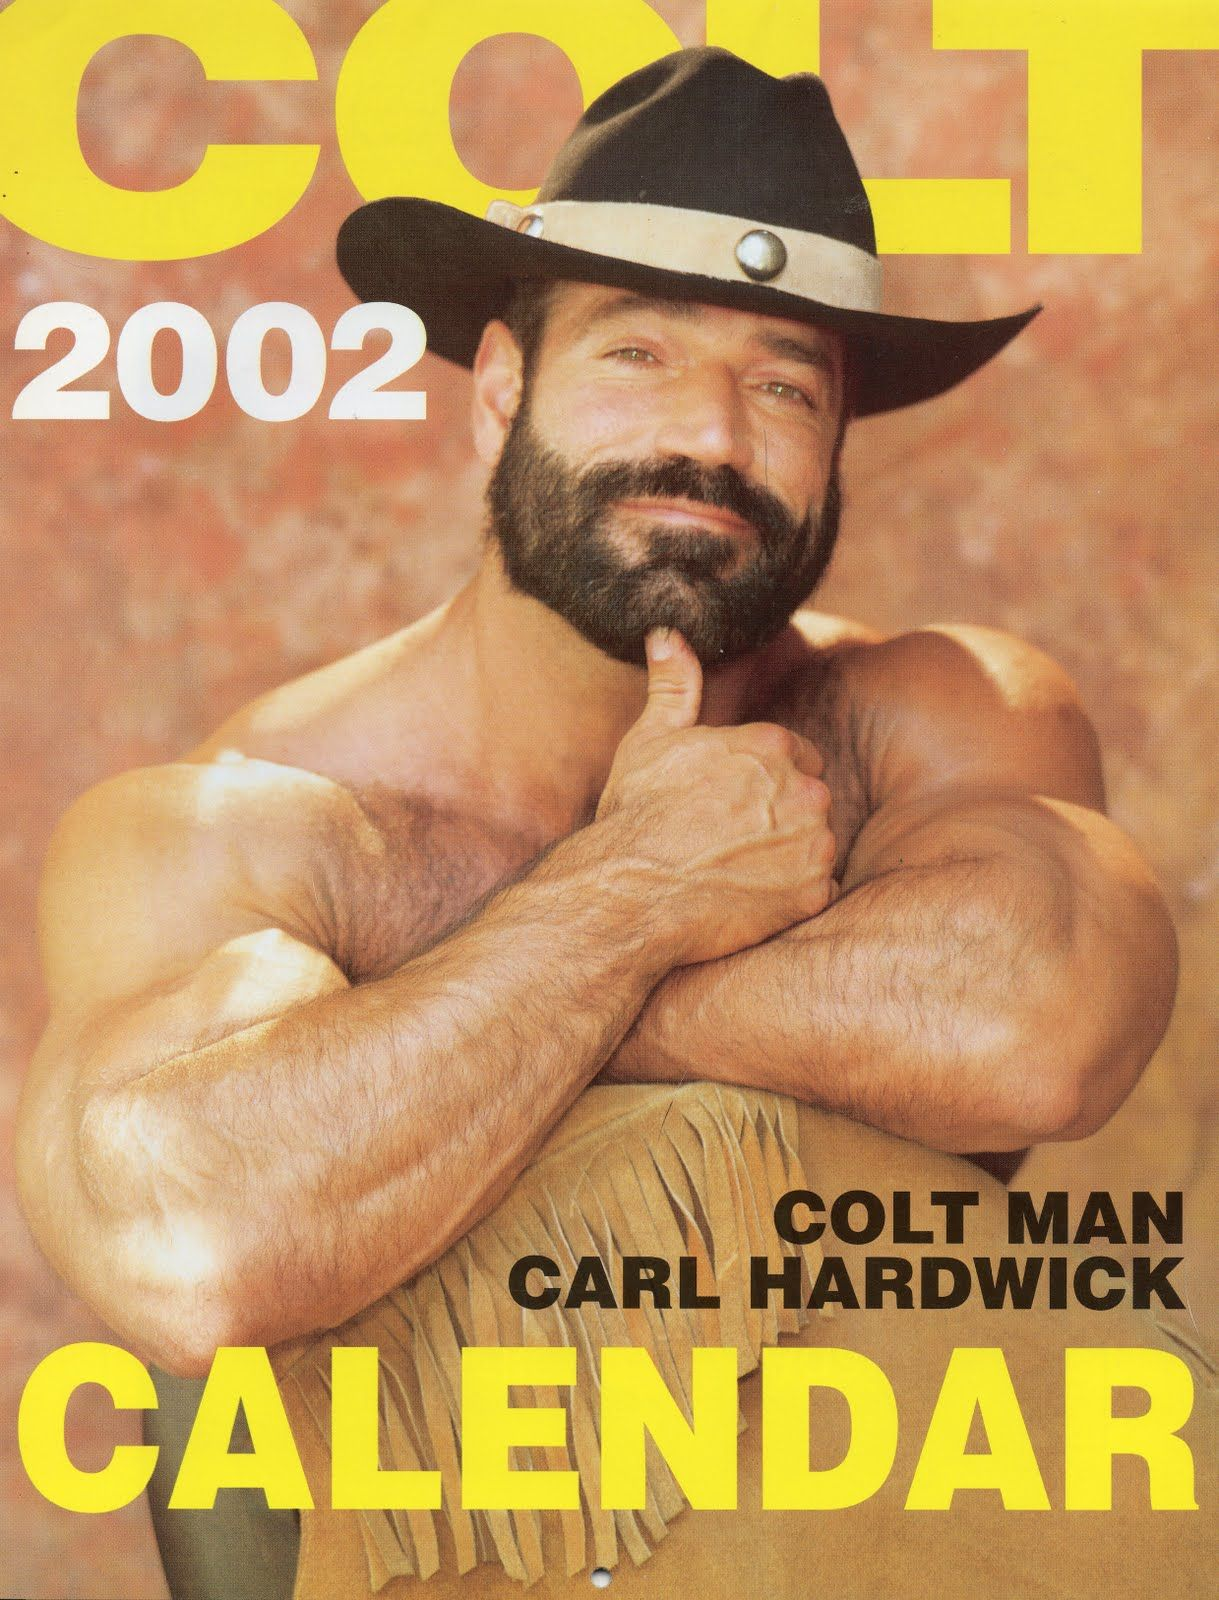 colt Carl hardwick